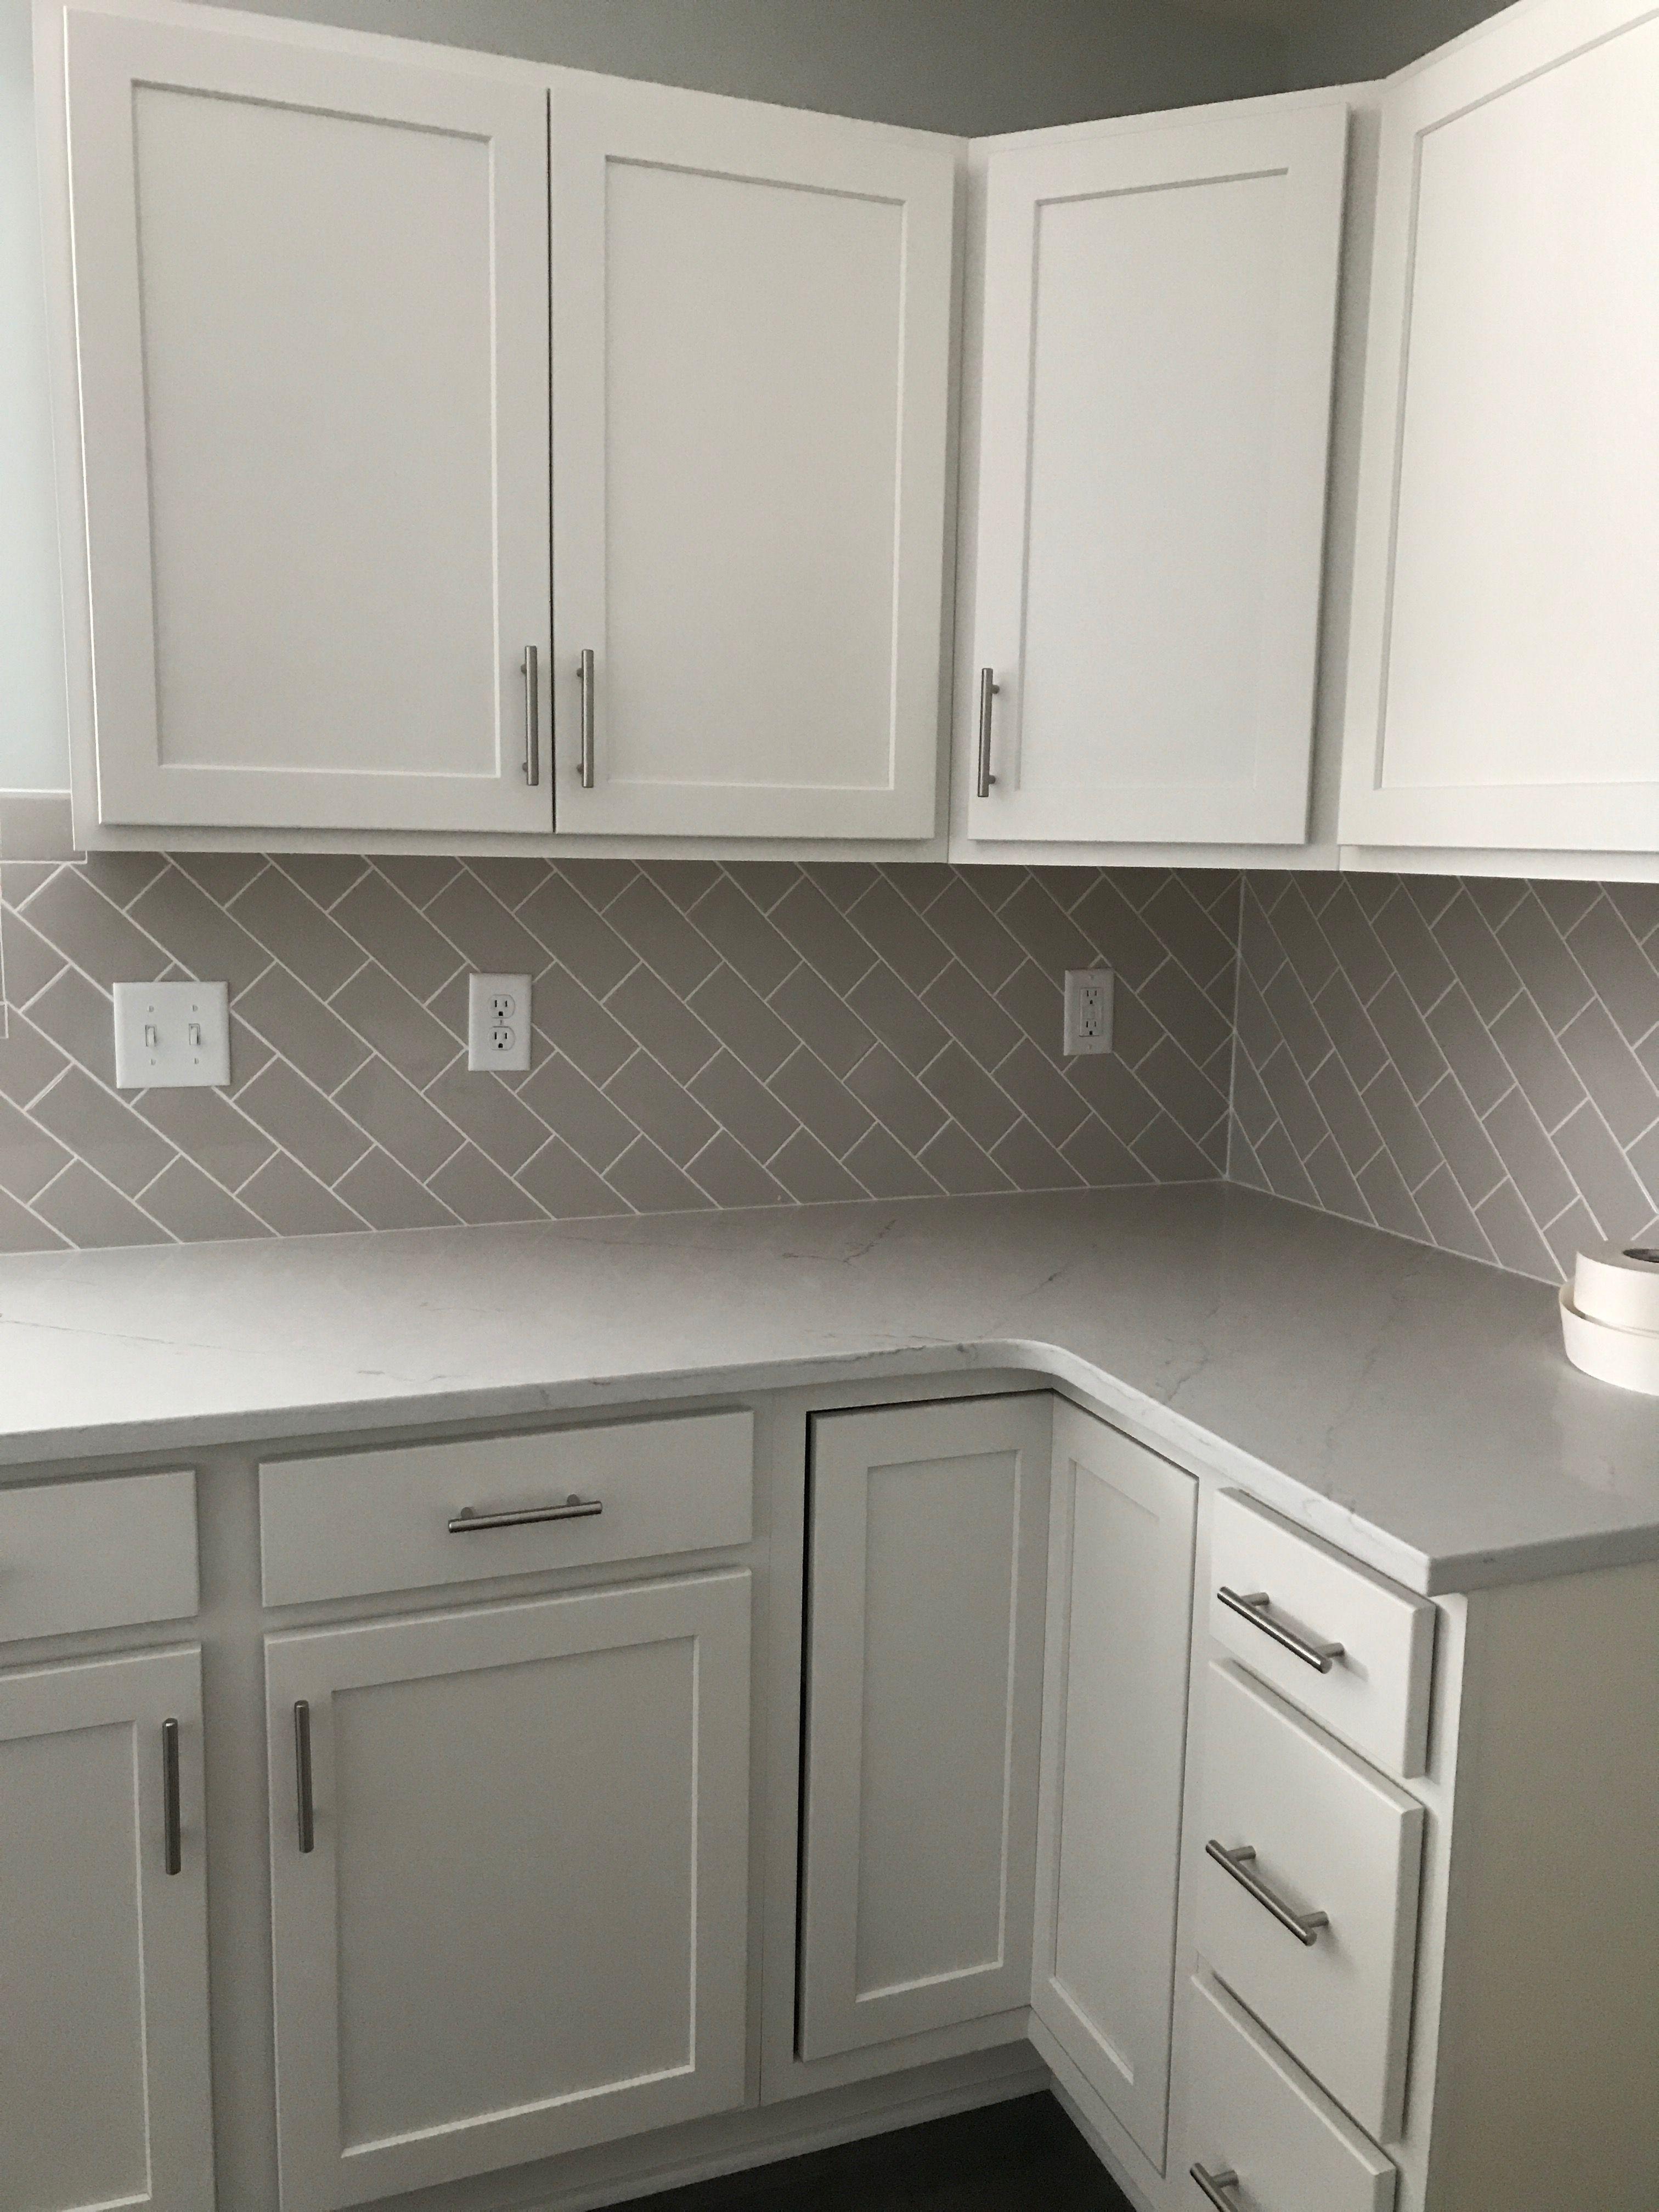 Diagonal Offset 3x6 Kitchen Backsplash White Tile Kitchen